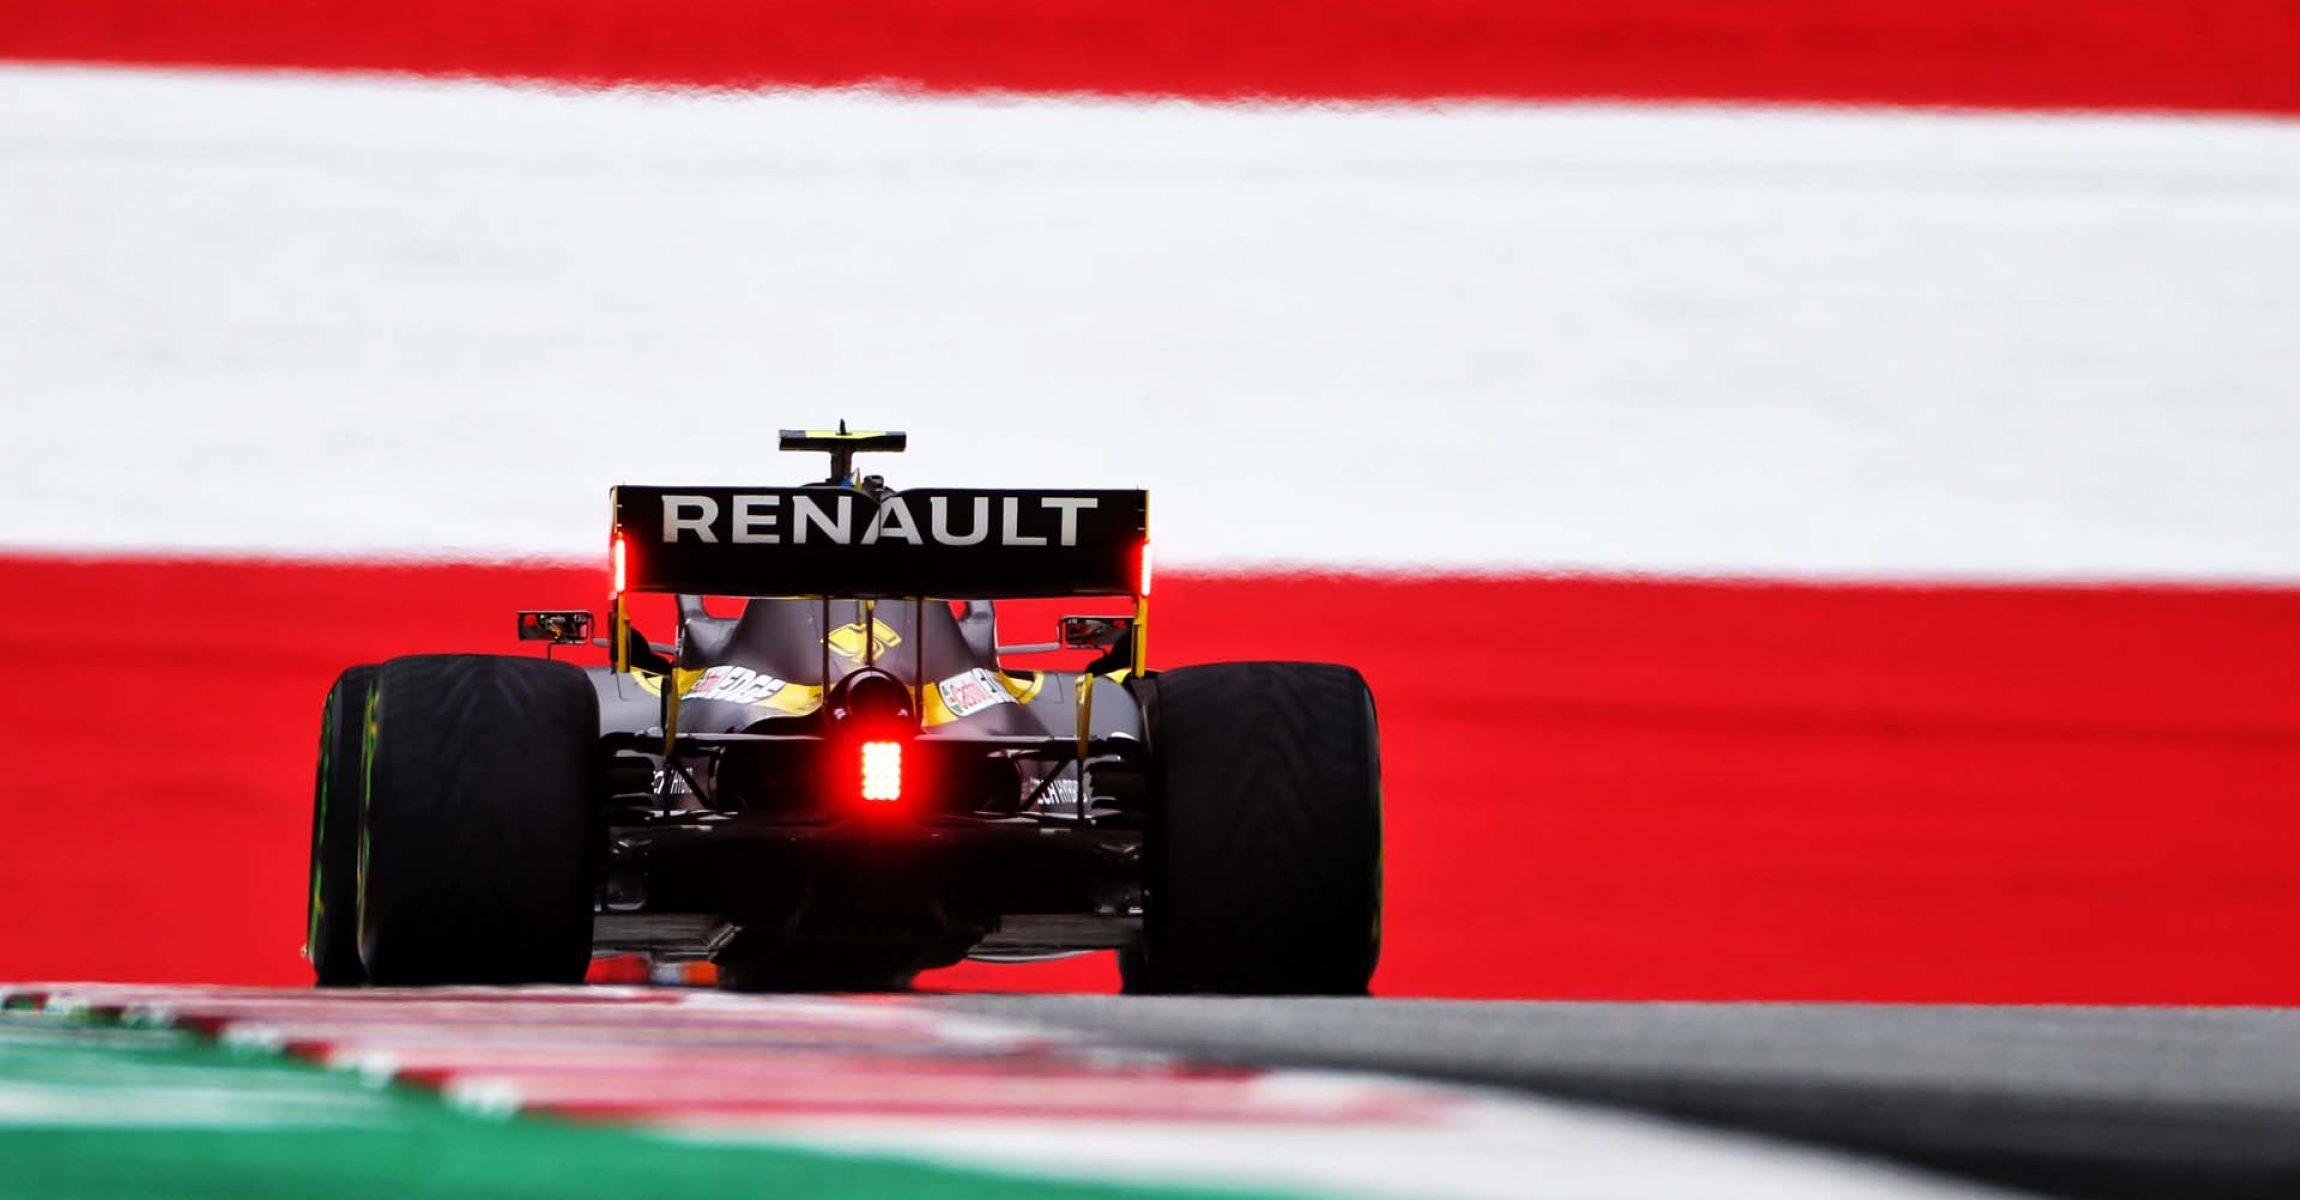 Esteban Ocon (FRA) Renault F1 Team RS20. Austrian Grand Prix, Friday 3rd July 2020. Spielberg, Austria.